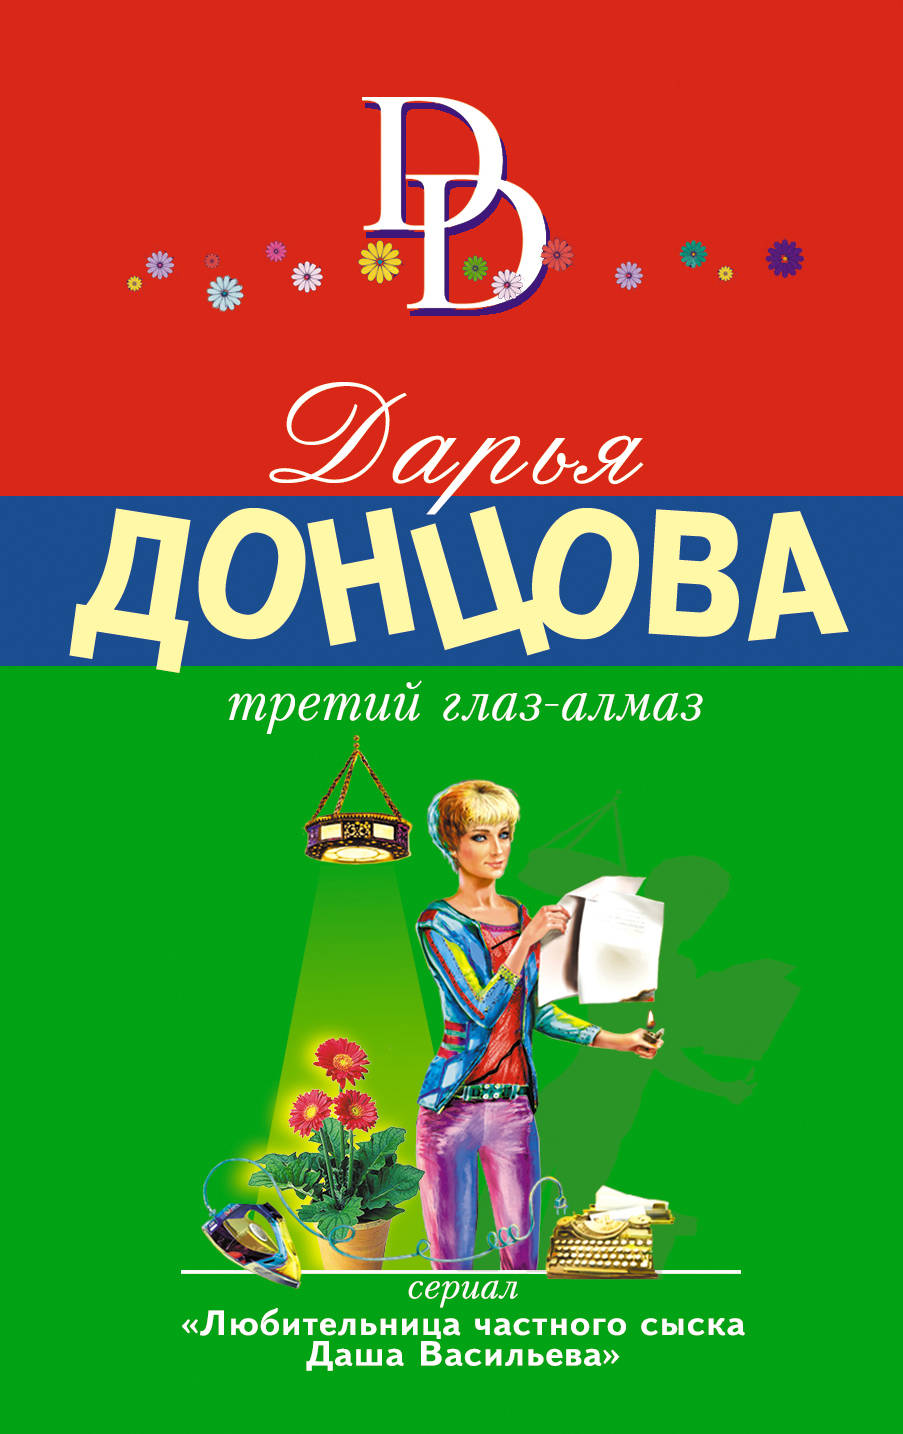 Дарья Донцова Третий глаз-алмаз